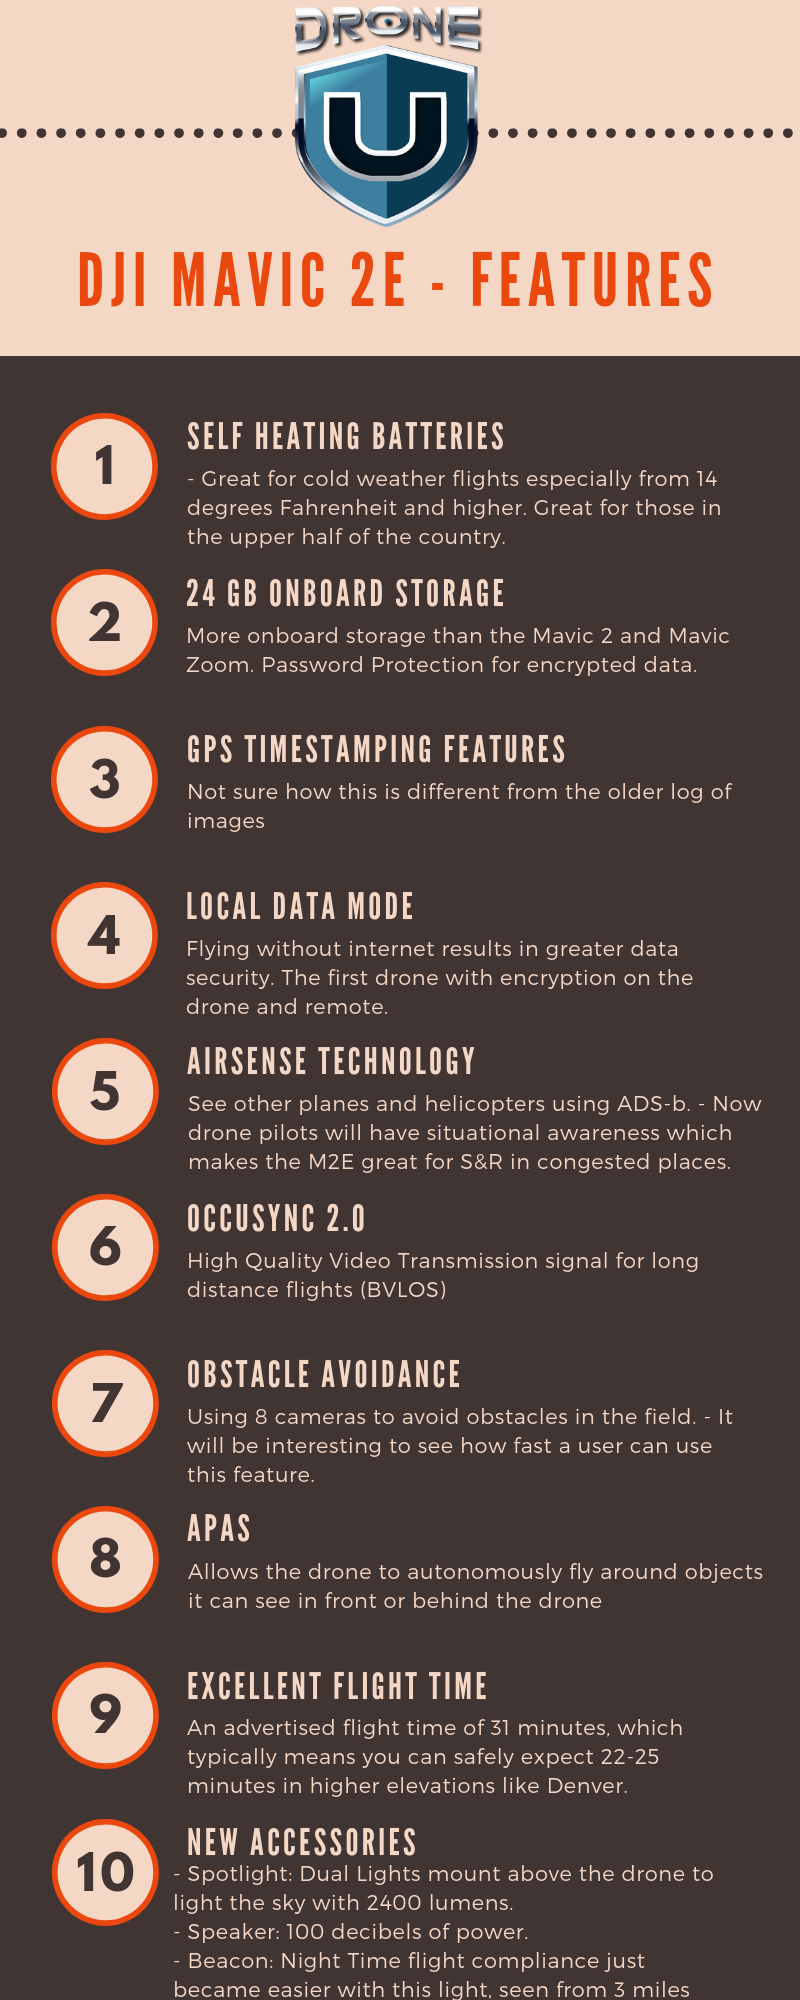 DJI Mavic 2 Enterprise Revealed – Reasons Why I Am Getting